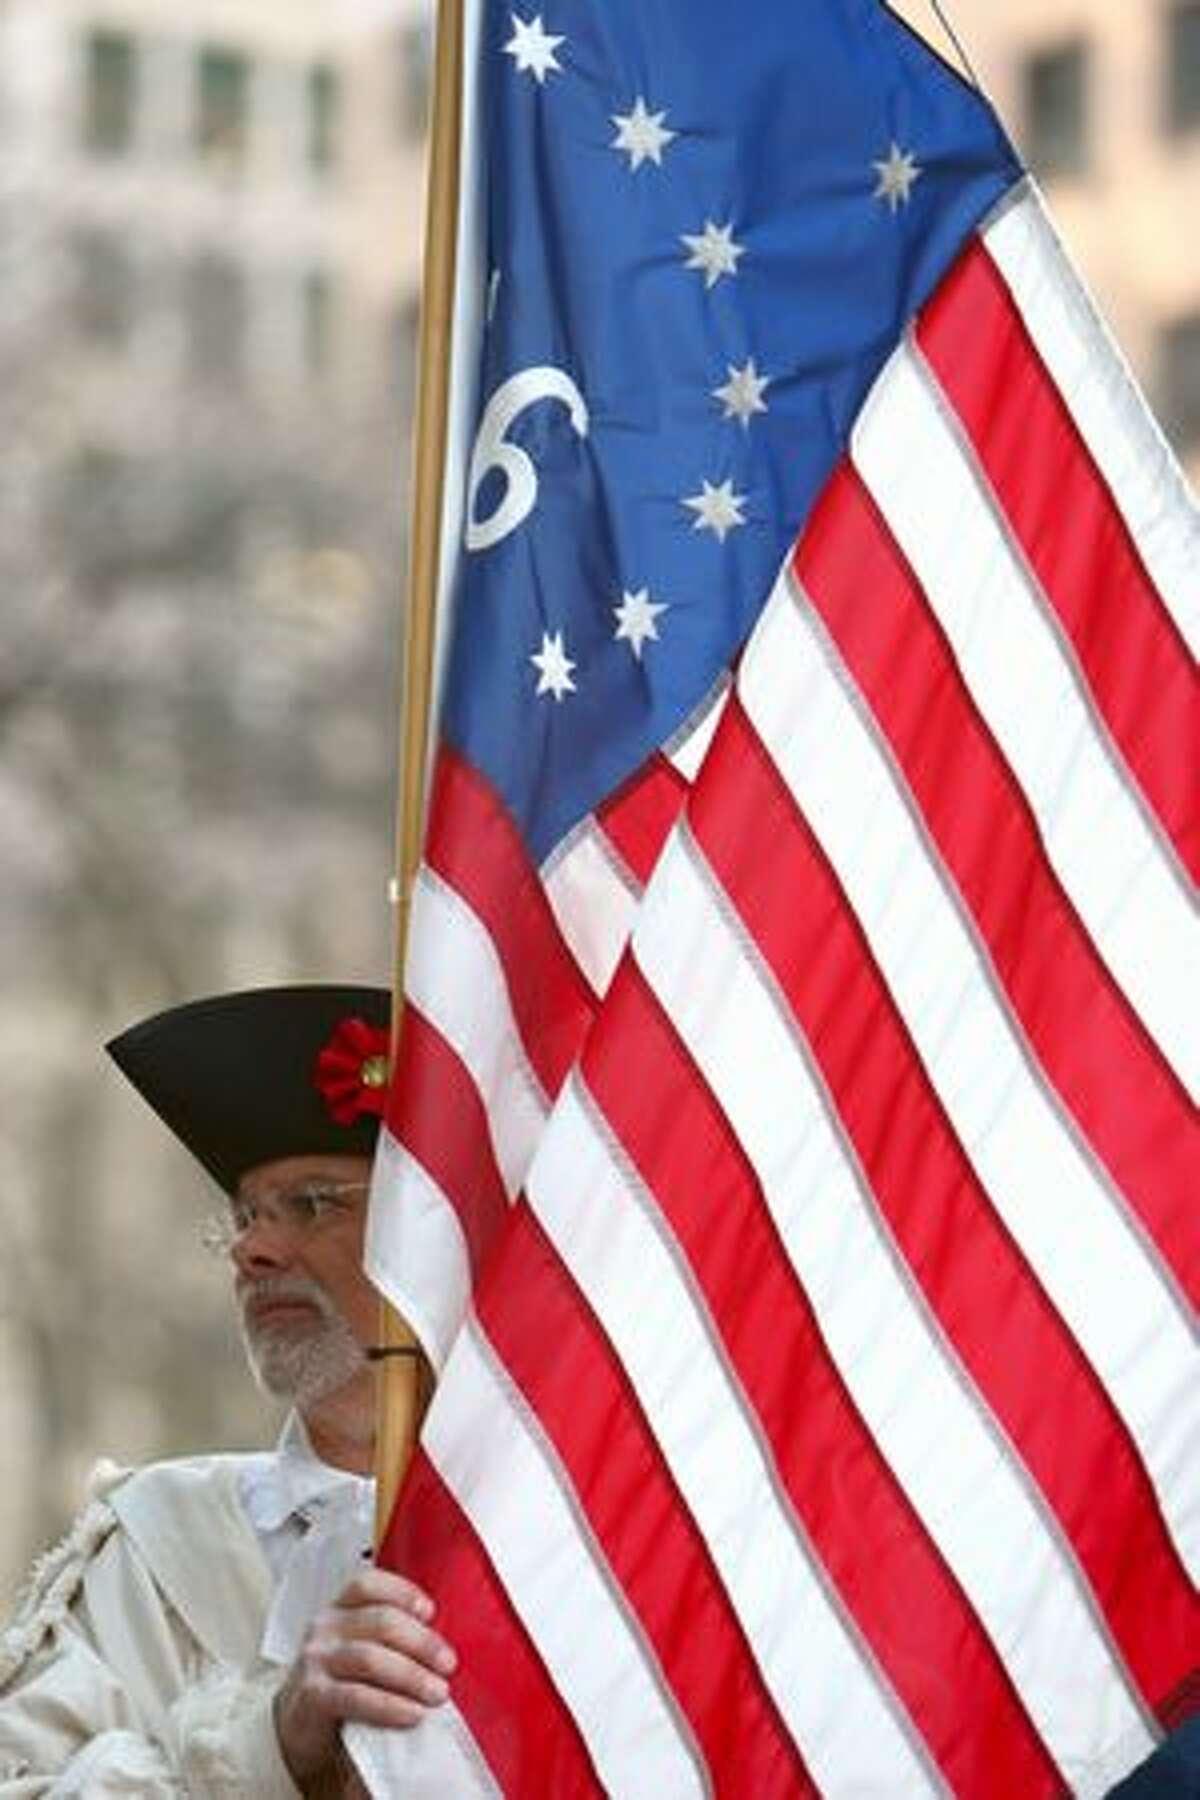 A participant holds a flag.